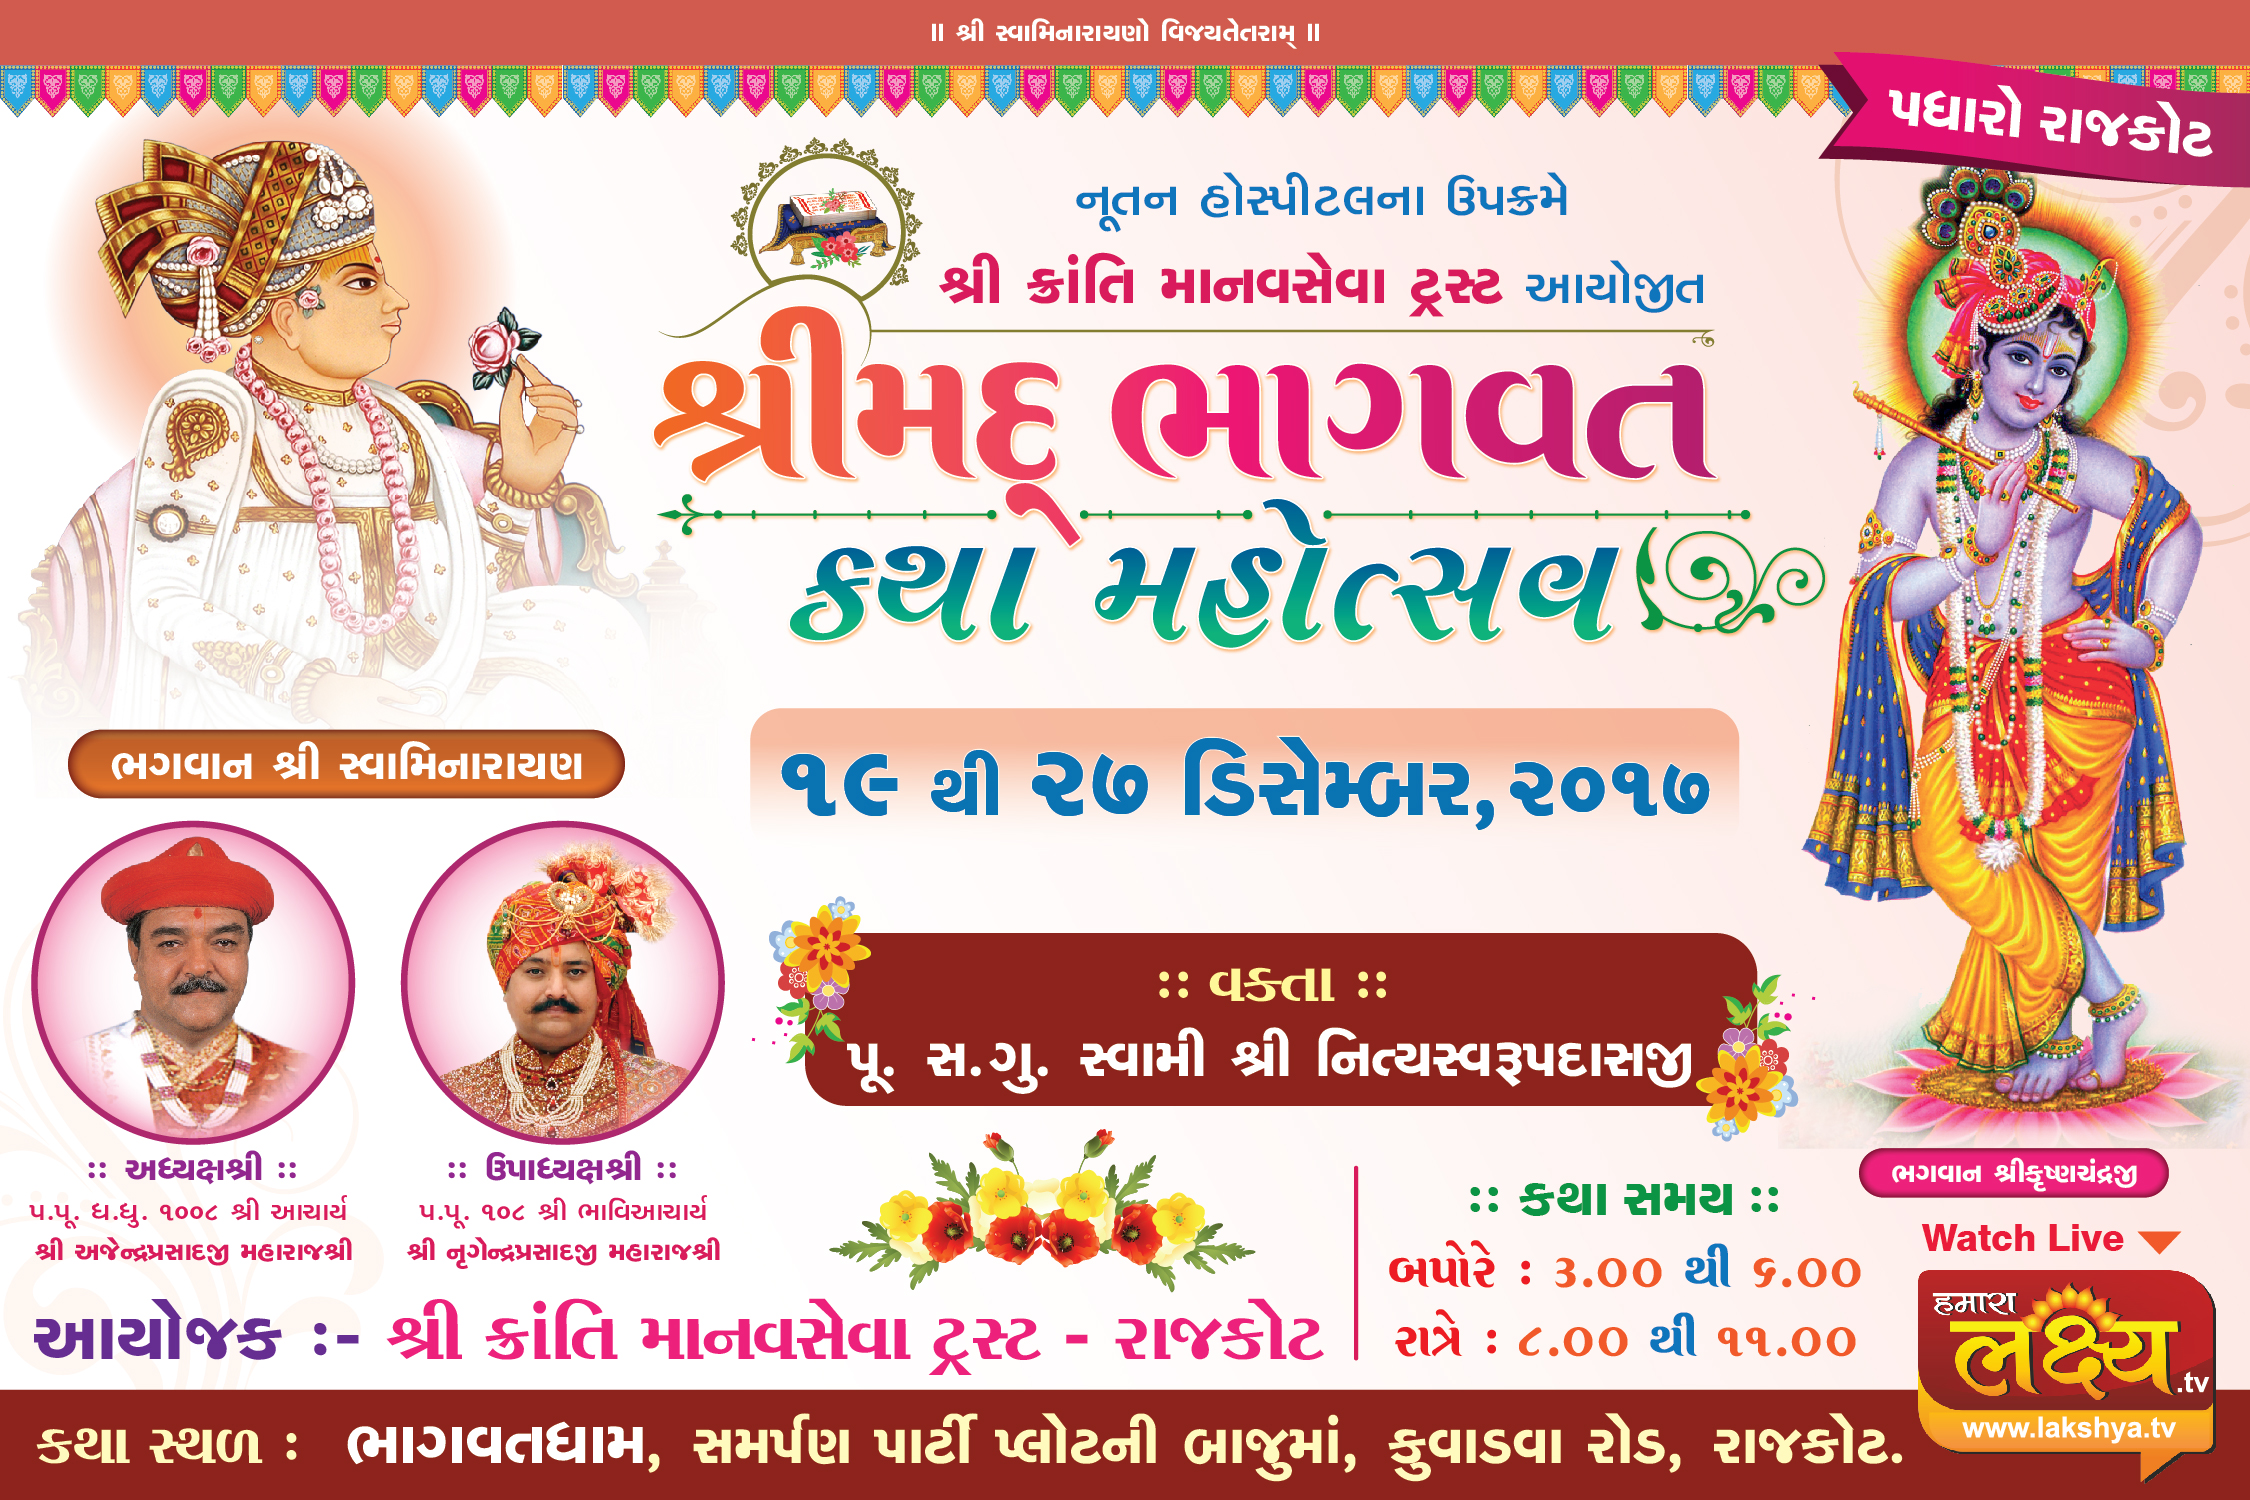 bhagwat swaminarayan vadtal